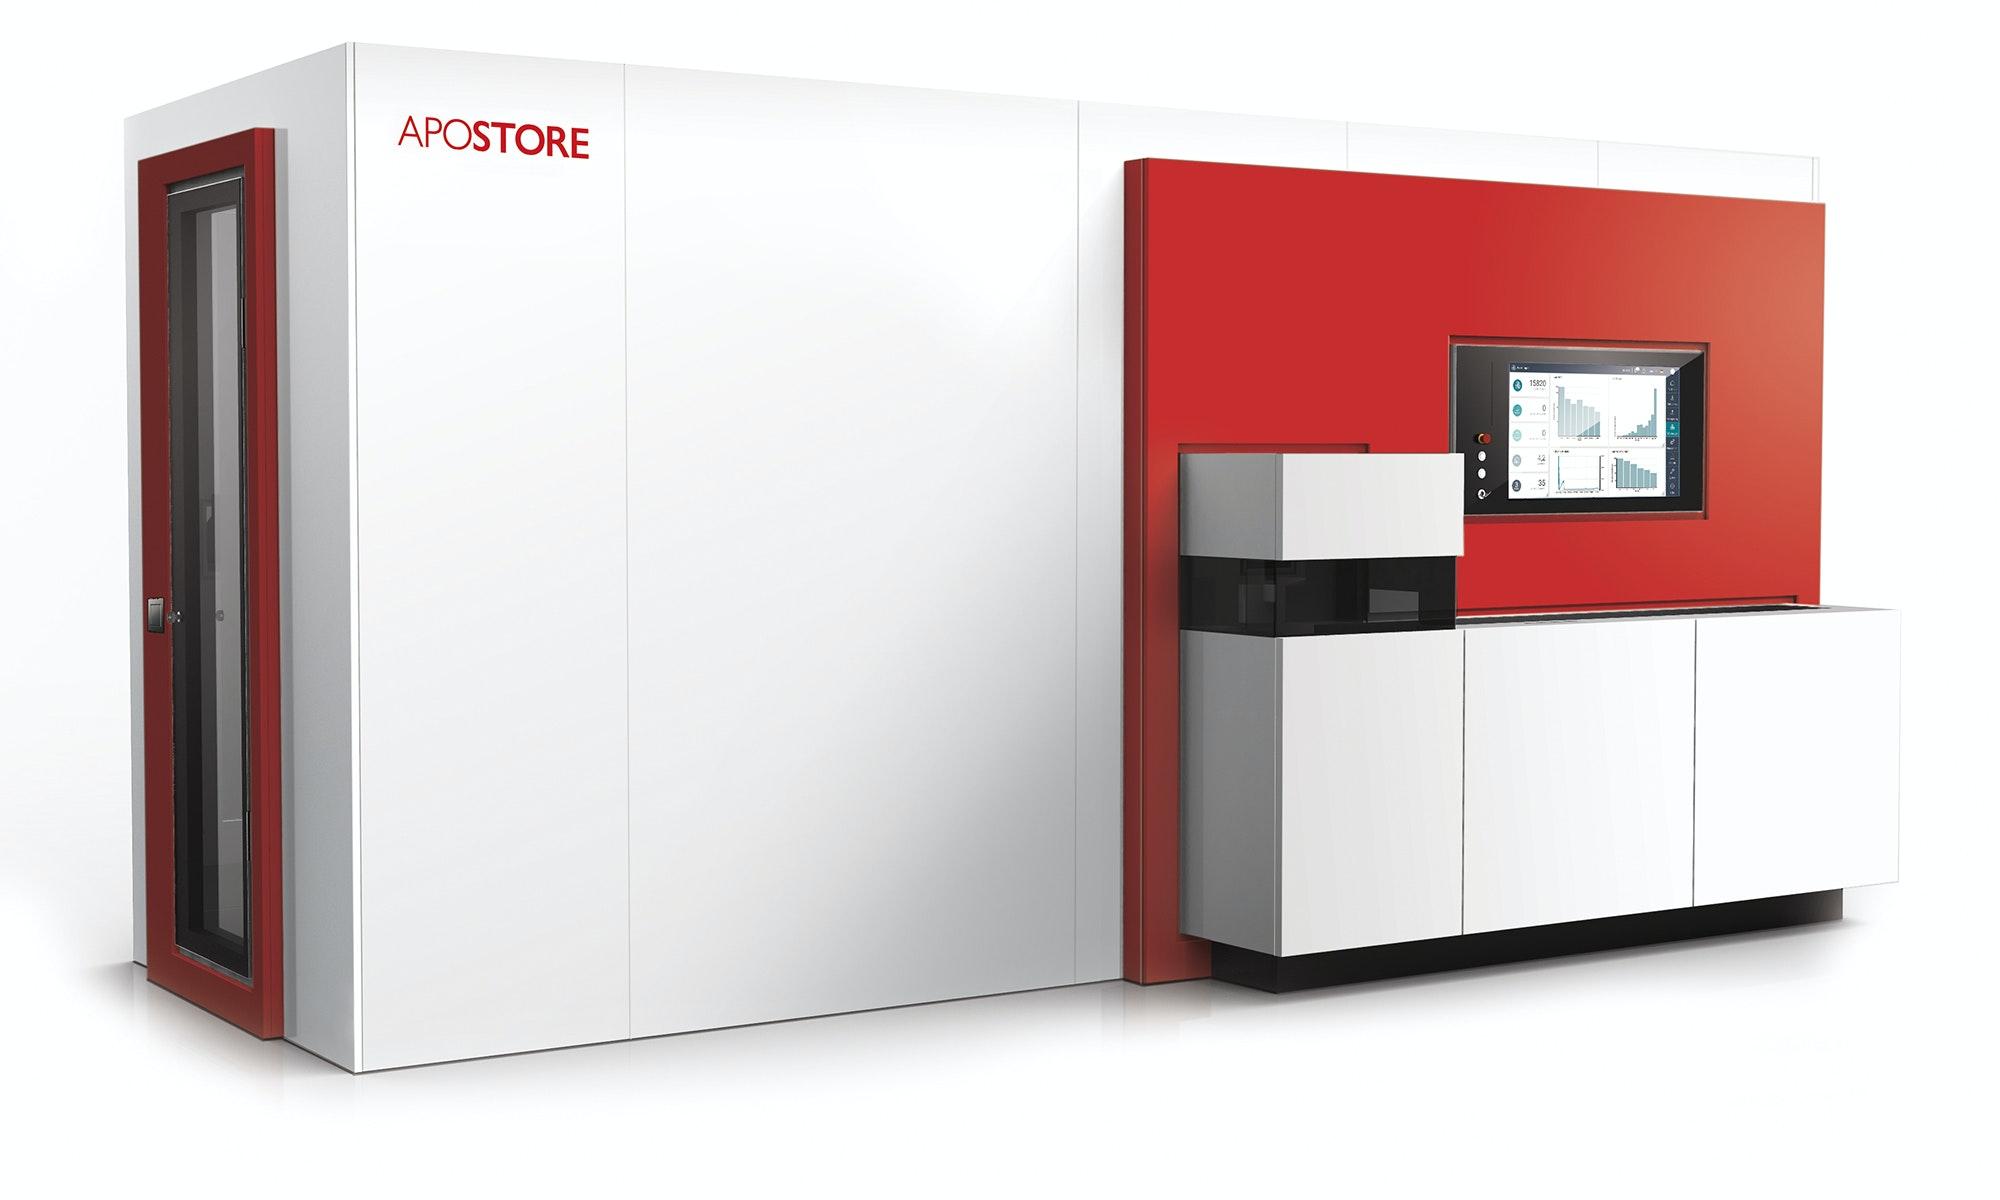 A2000 Kommissionierautomat DigitaleApotheke rot